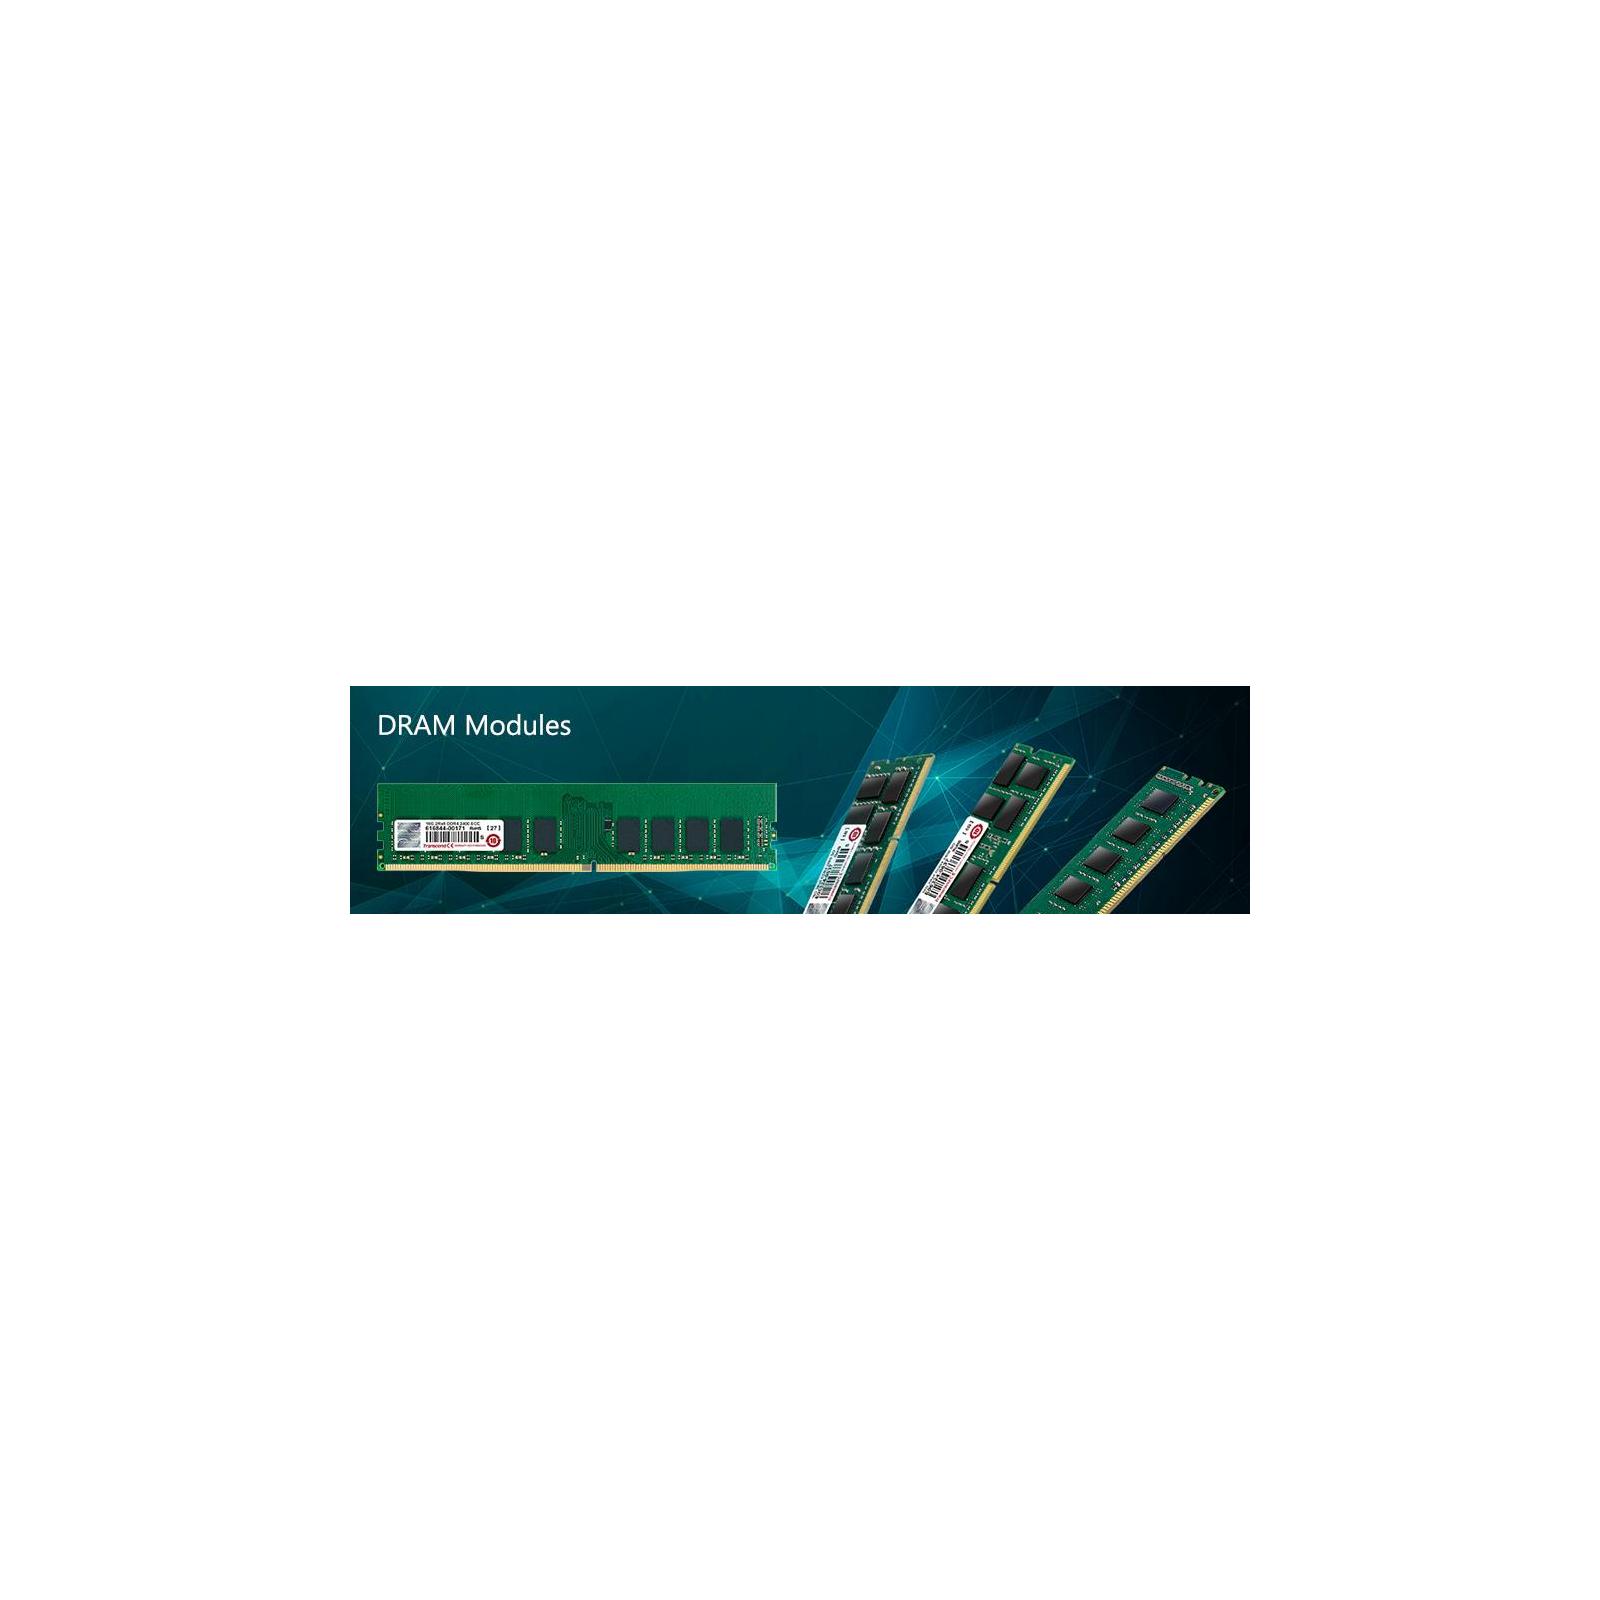 Модуль памяти для сервера DDR4 8GB ECC UDIMM 2400MHz 1Rx8 1.2V CL17 Transcend (TS1GLH72V4B) изображение 2